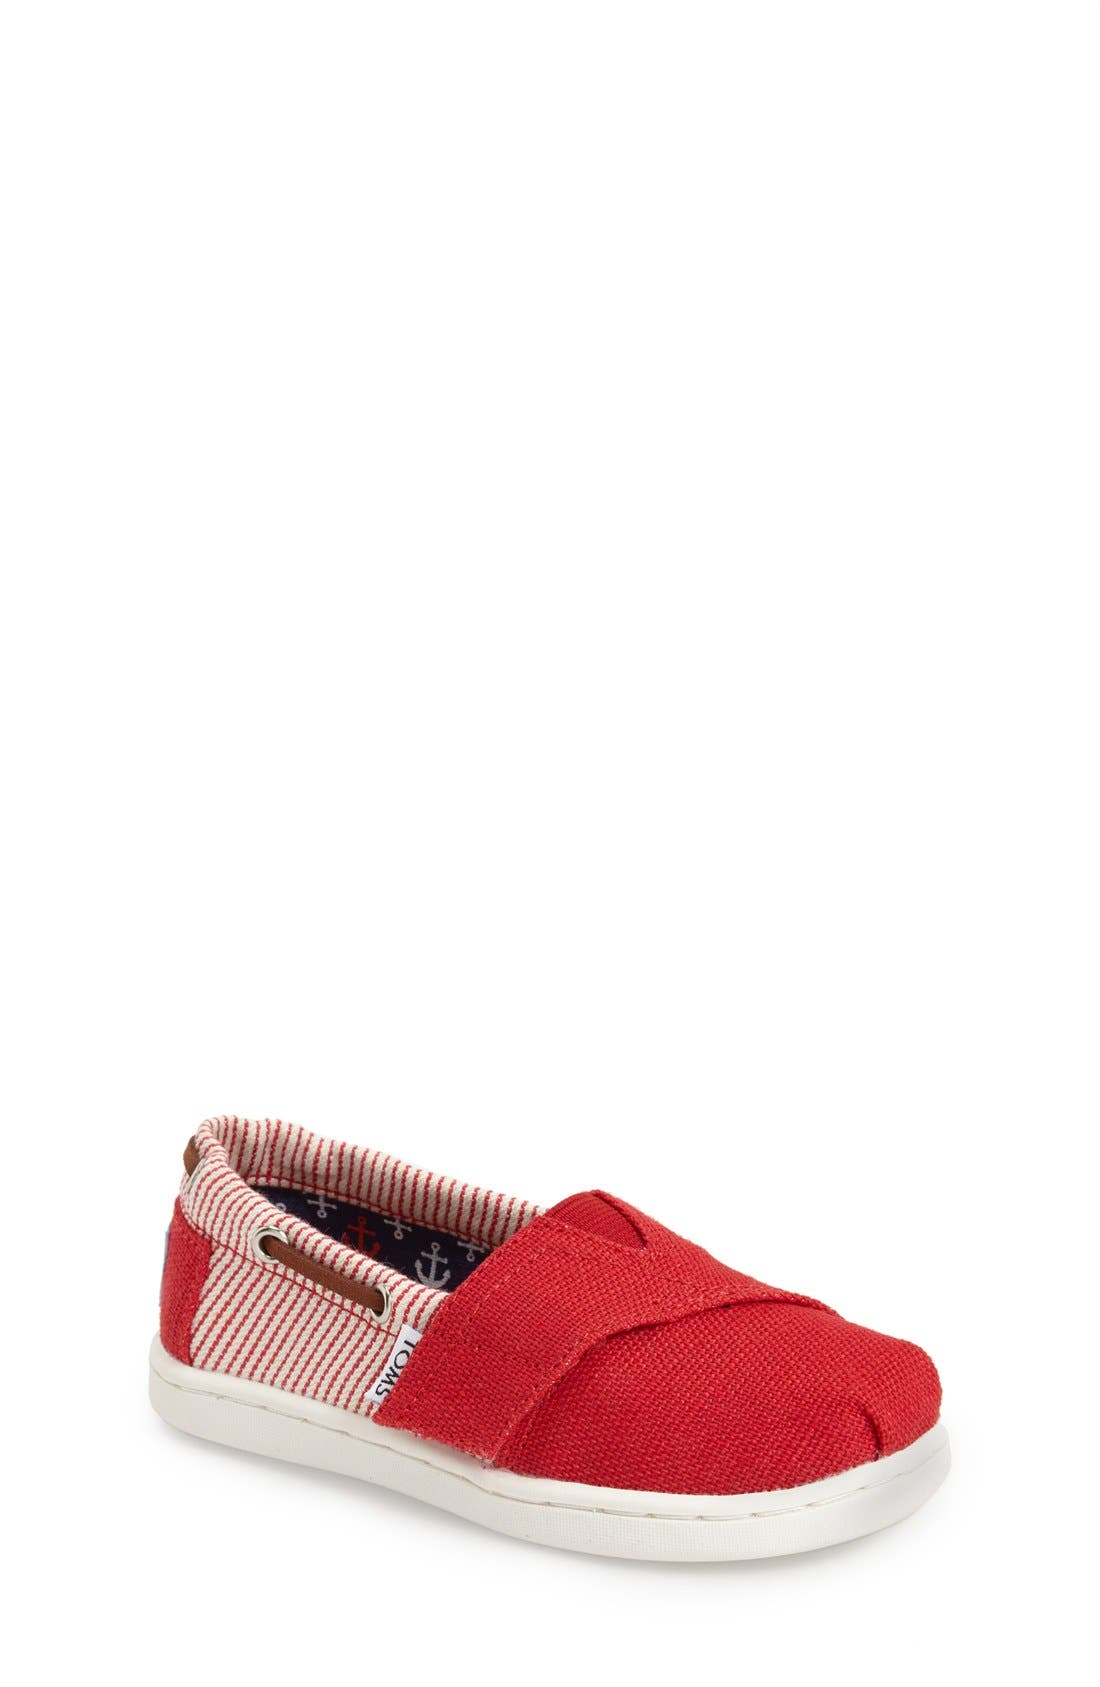 'Bimini - Tiny' Slip-On,                         Main,                         color, Medium Red